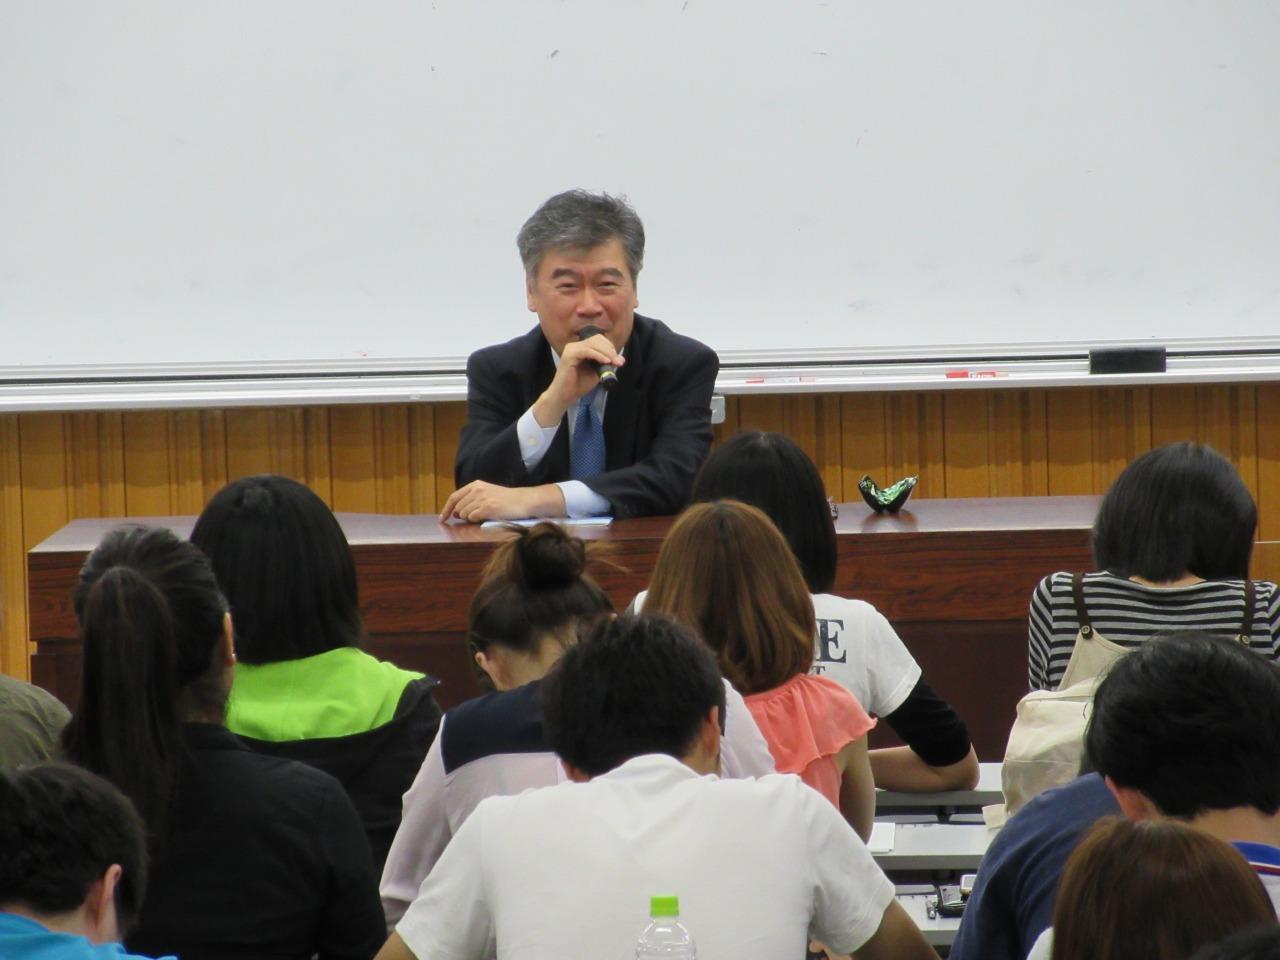 http://www.shinshu-u.ac.jp/faculty/econlaw/topics/images/IMG_0769.jpg